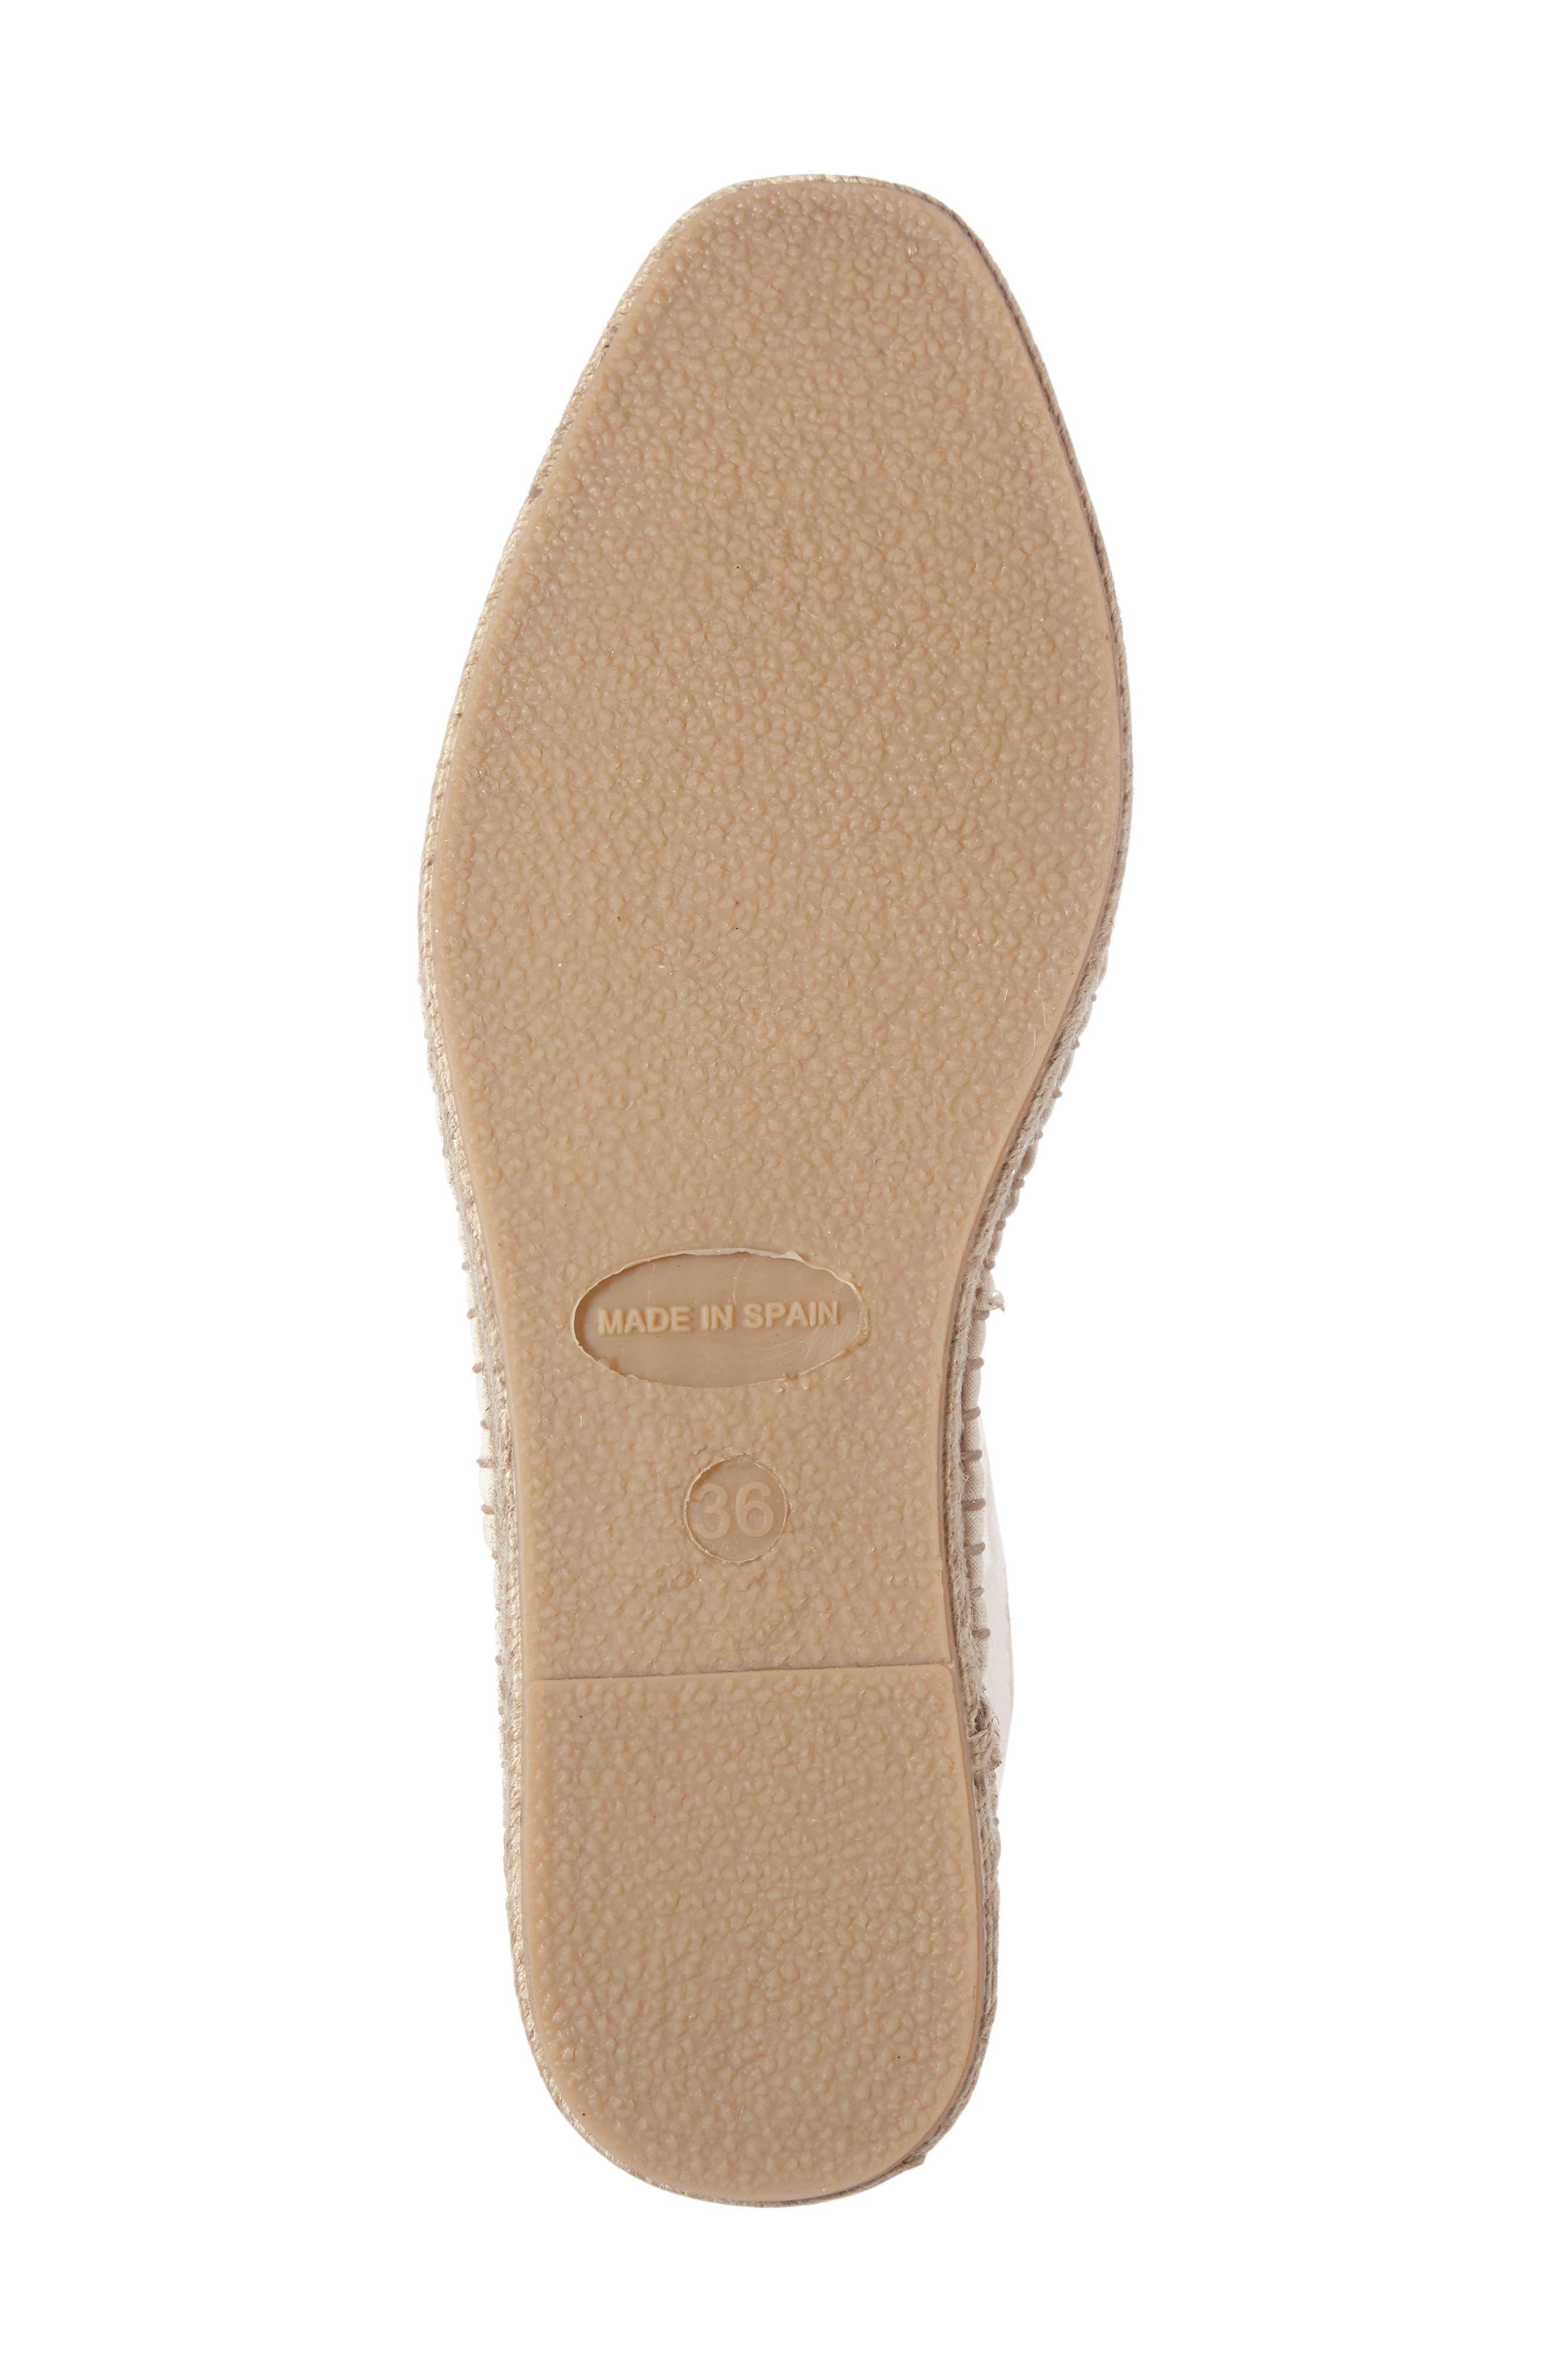 Ivon Espadrille Sneaker,                             Alternate thumbnail 4, color,                             Ecru Fabric